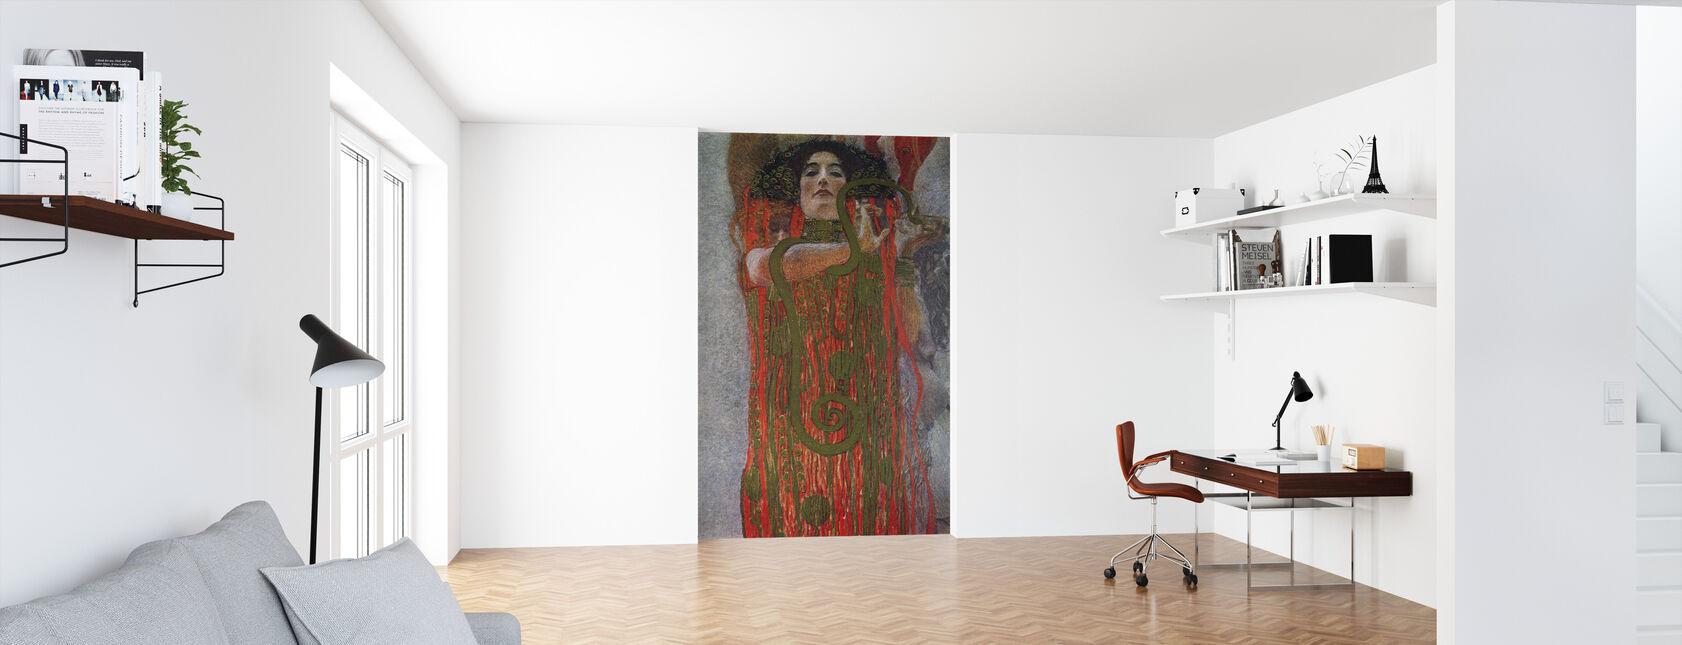 Hygieia - Gustav Klimt - Wallpaper - Office